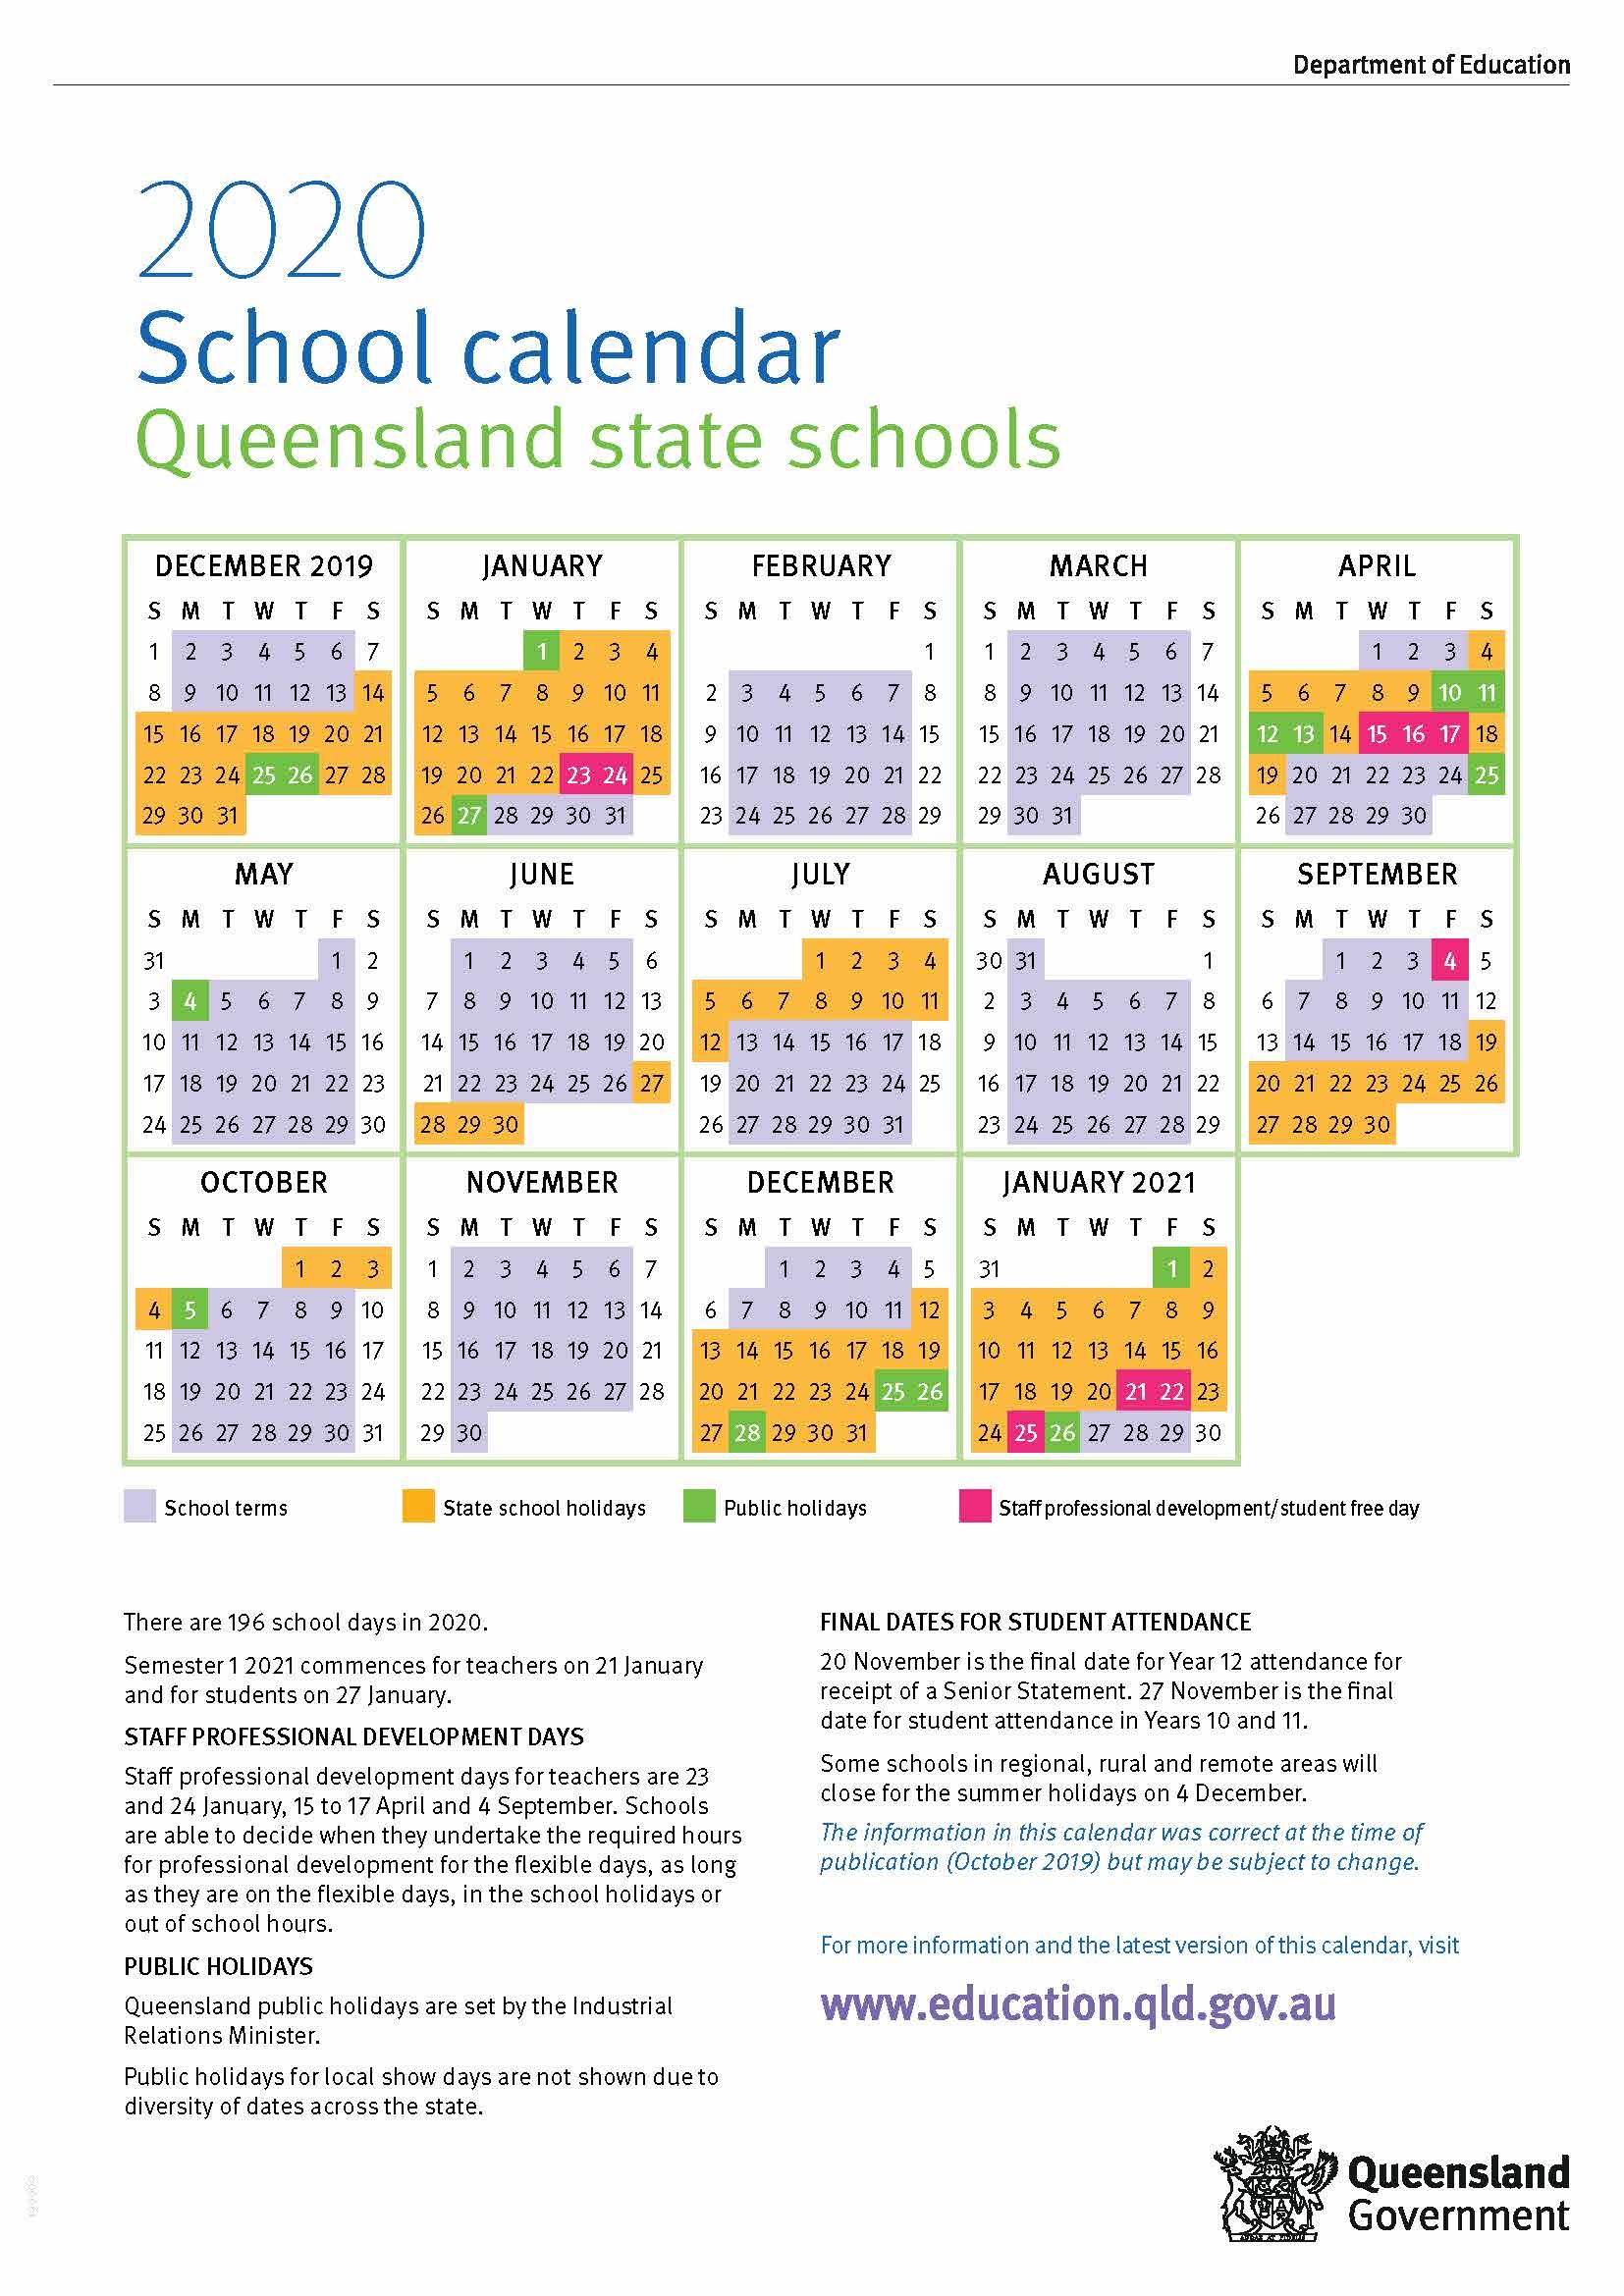 2020 Queensland State School Calendar